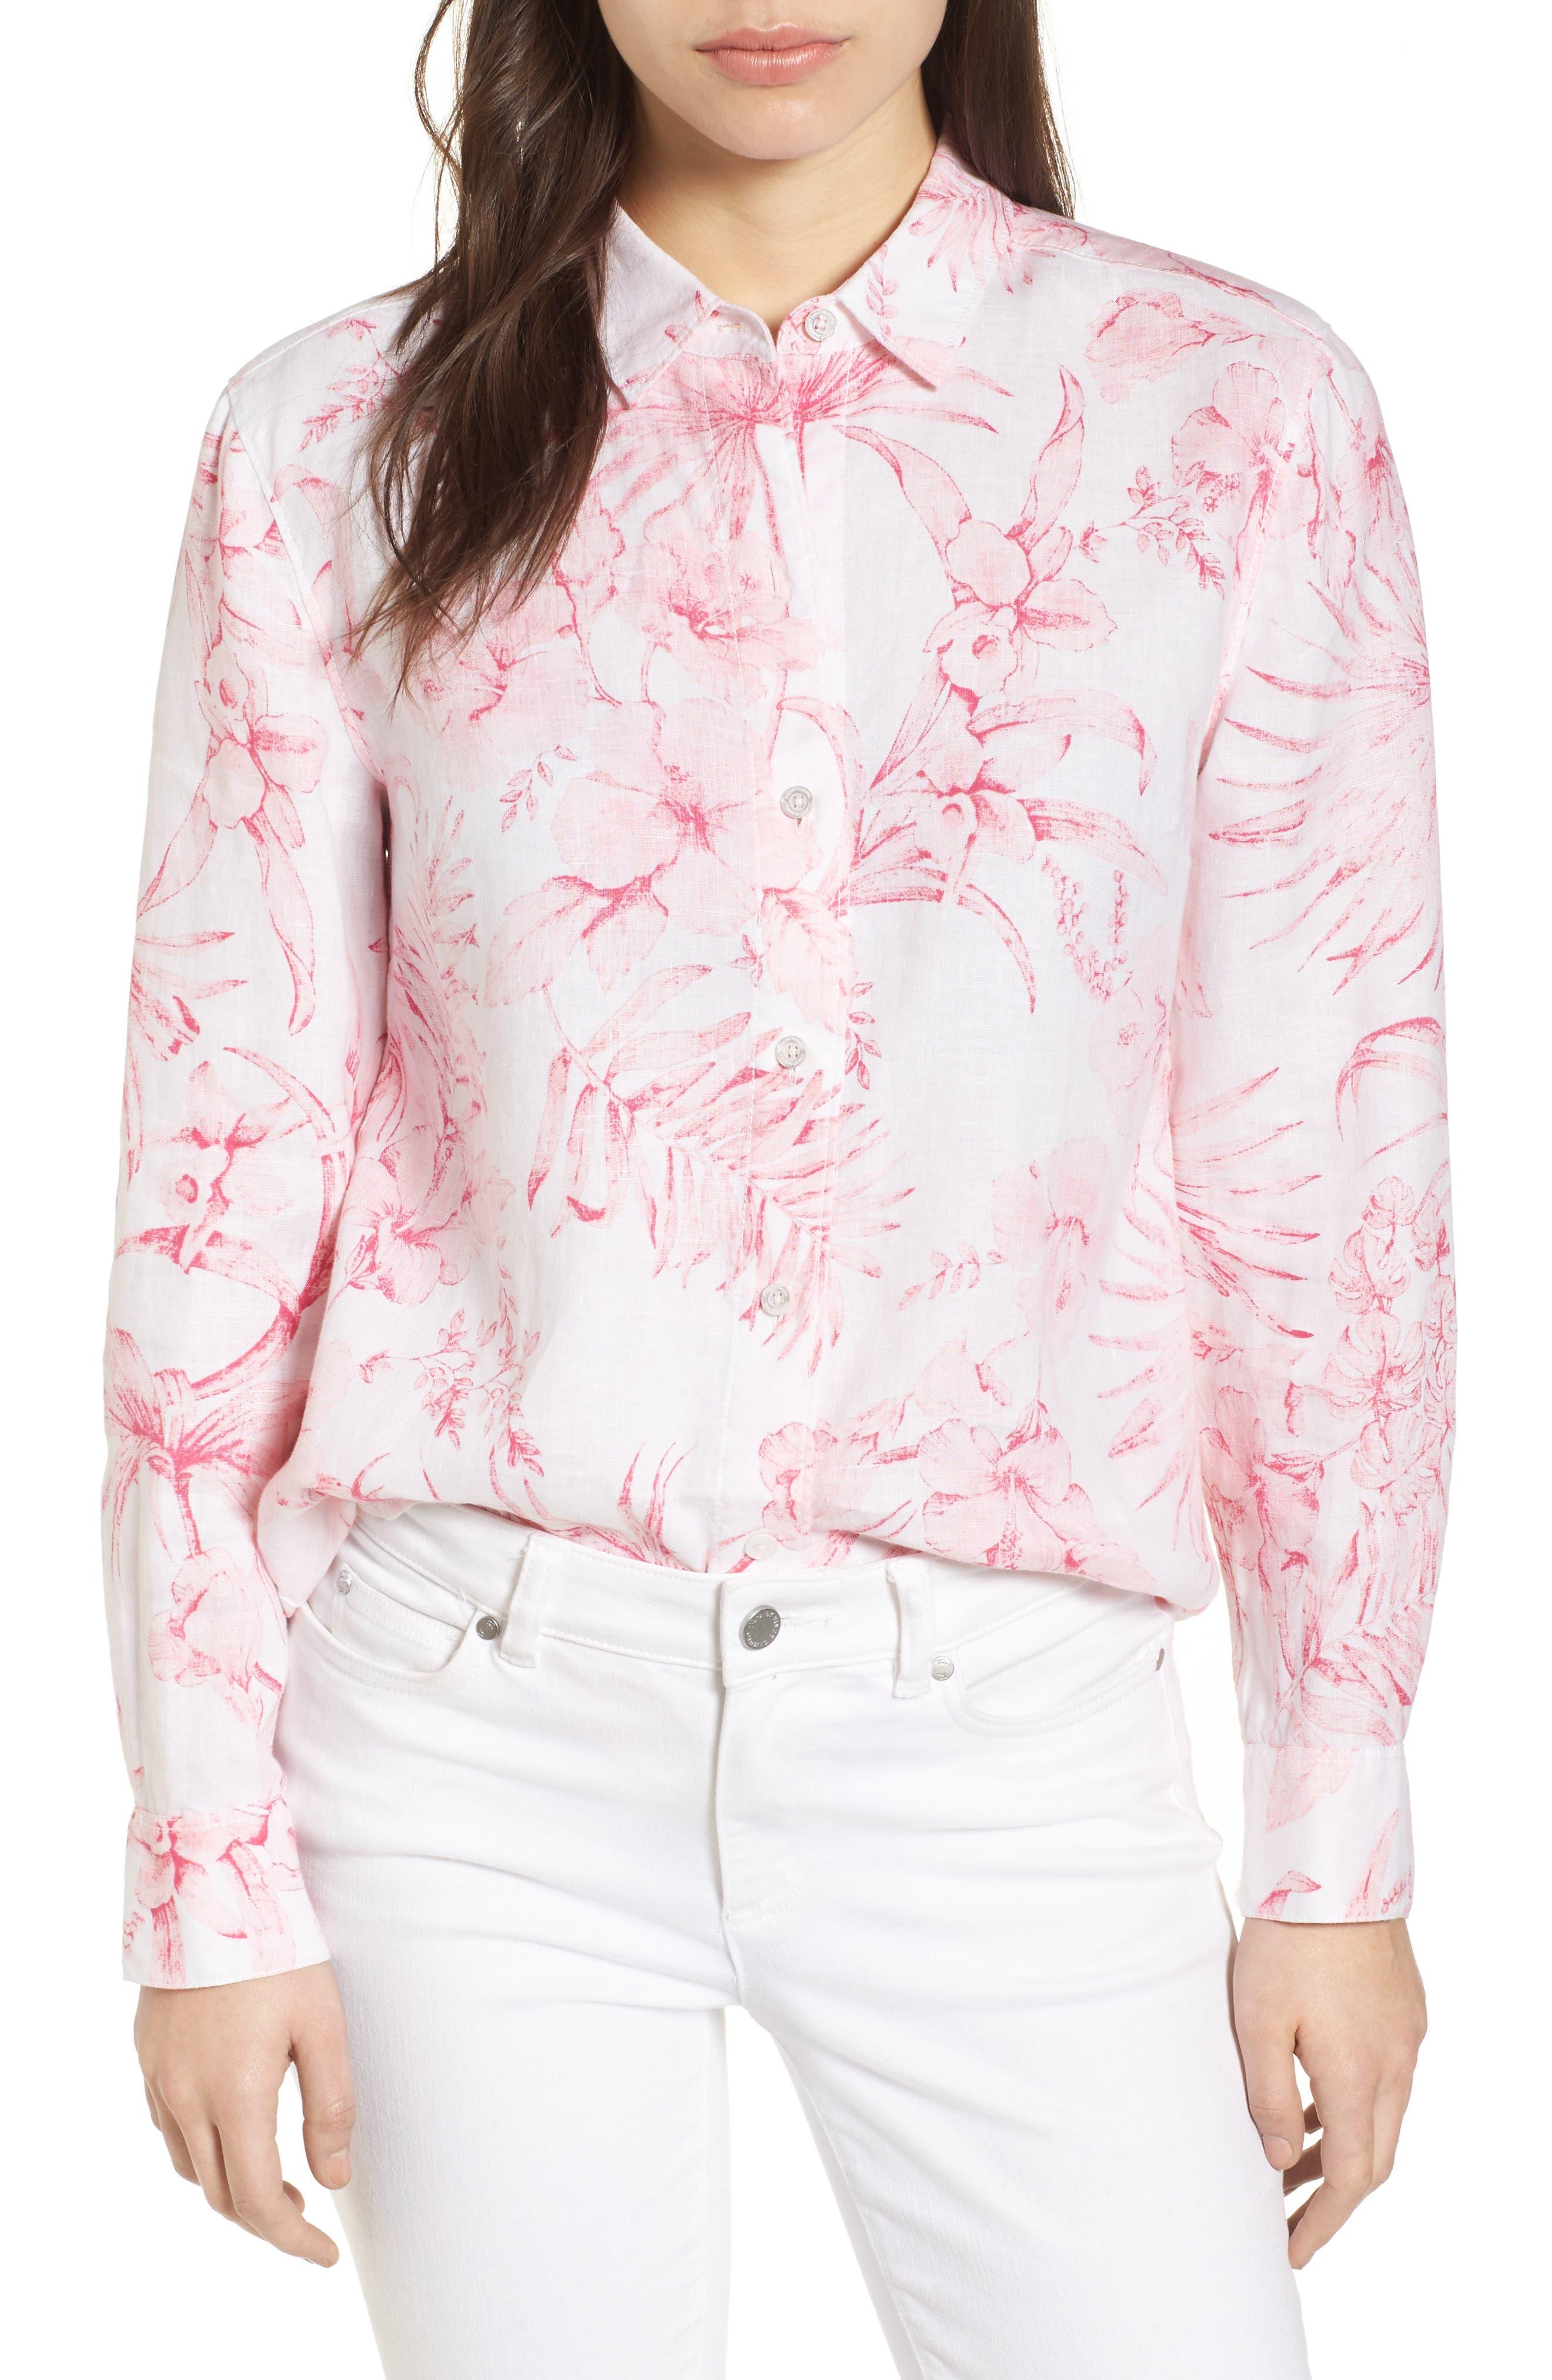 Tulum Tropical Linen Shirt,                             Main thumbnail 1, color,                             PINK LACE